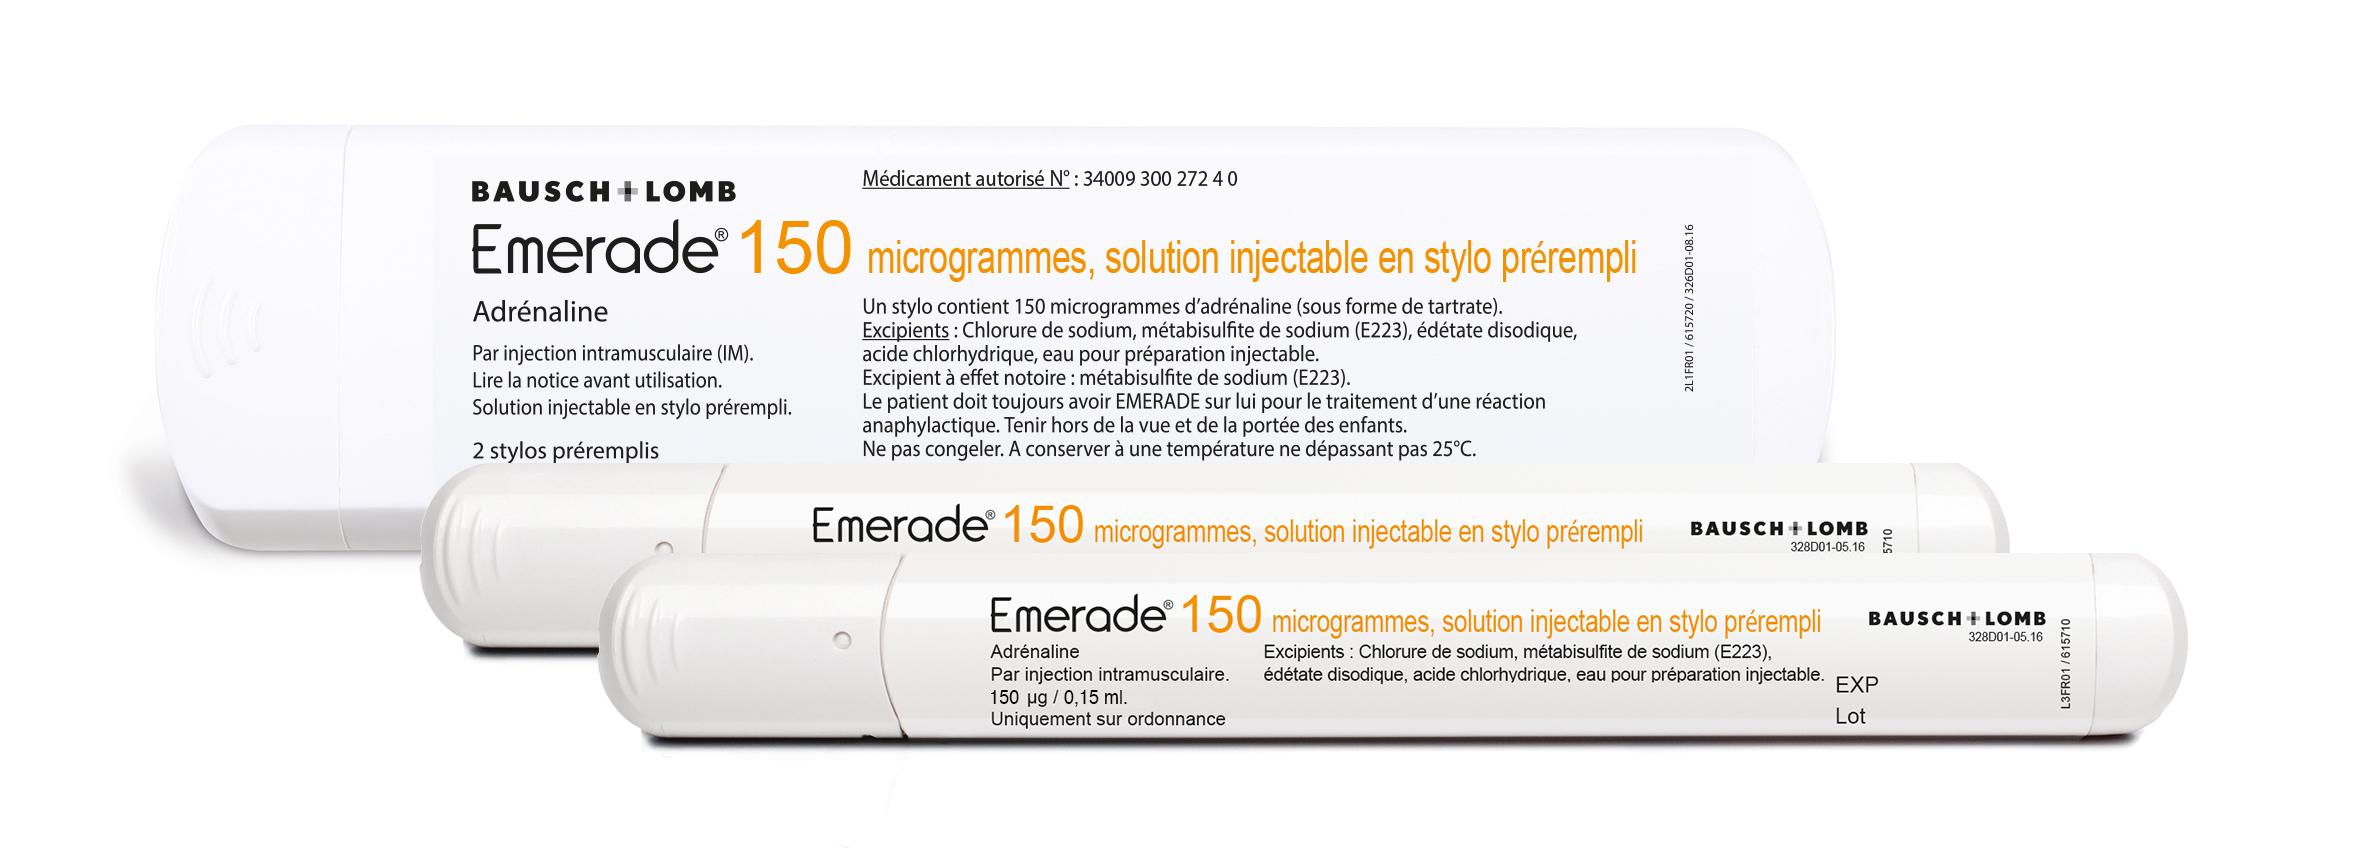 Image EMERADE Gé 150 µg S inj en stylo prérempli 2Stylo/0,15ml